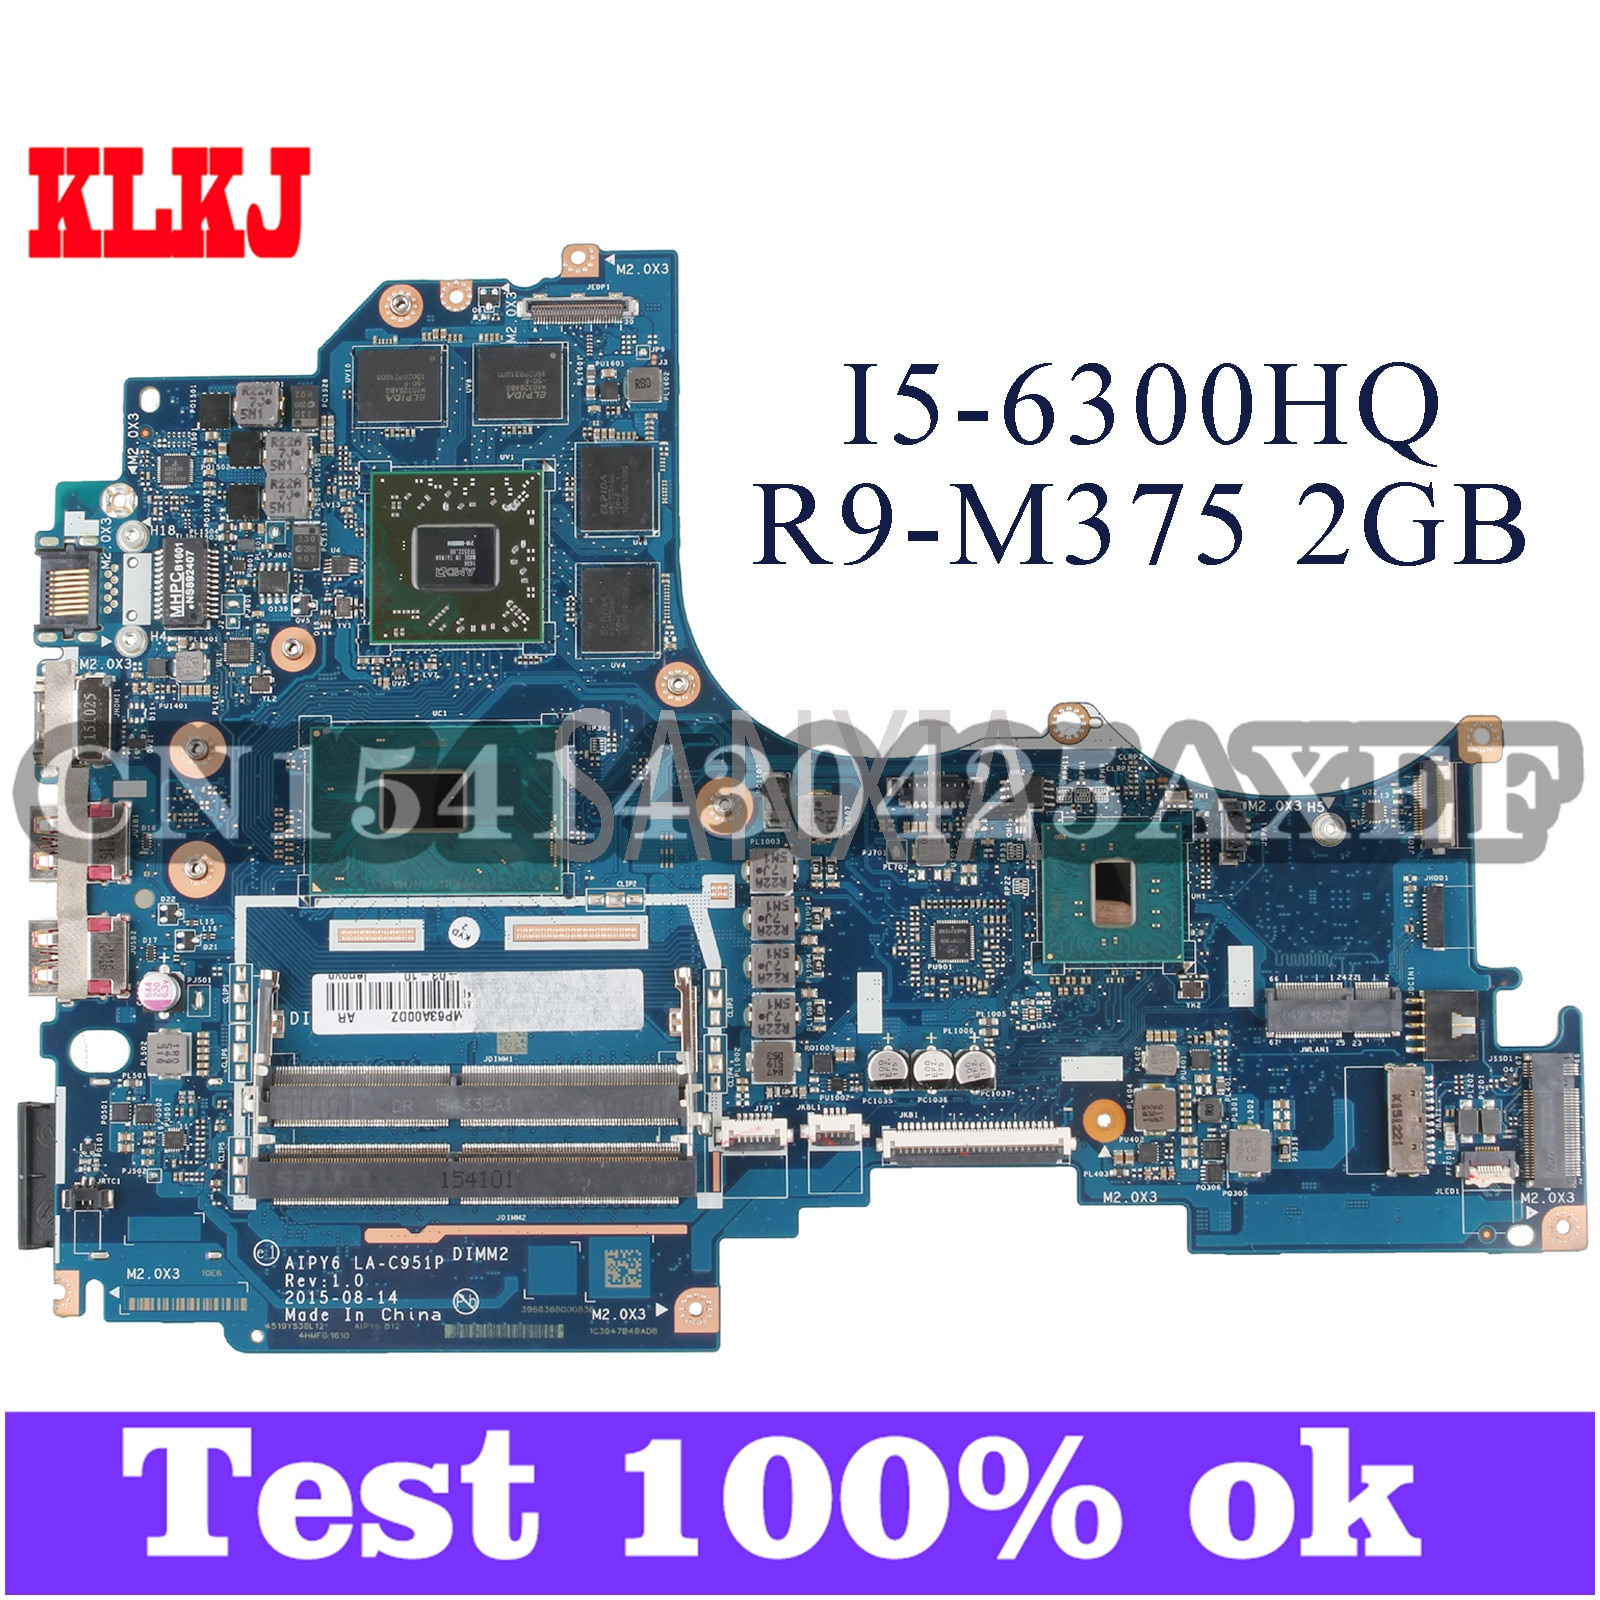 KLKJ AIPY6 LA-C951P اللوحة الأم لأجهزة الكمبيوتر المحمول لينوفو Y700-14ISK اللوحة الرئيسية الأصلية I5-6300HQ R9-M375 2GB